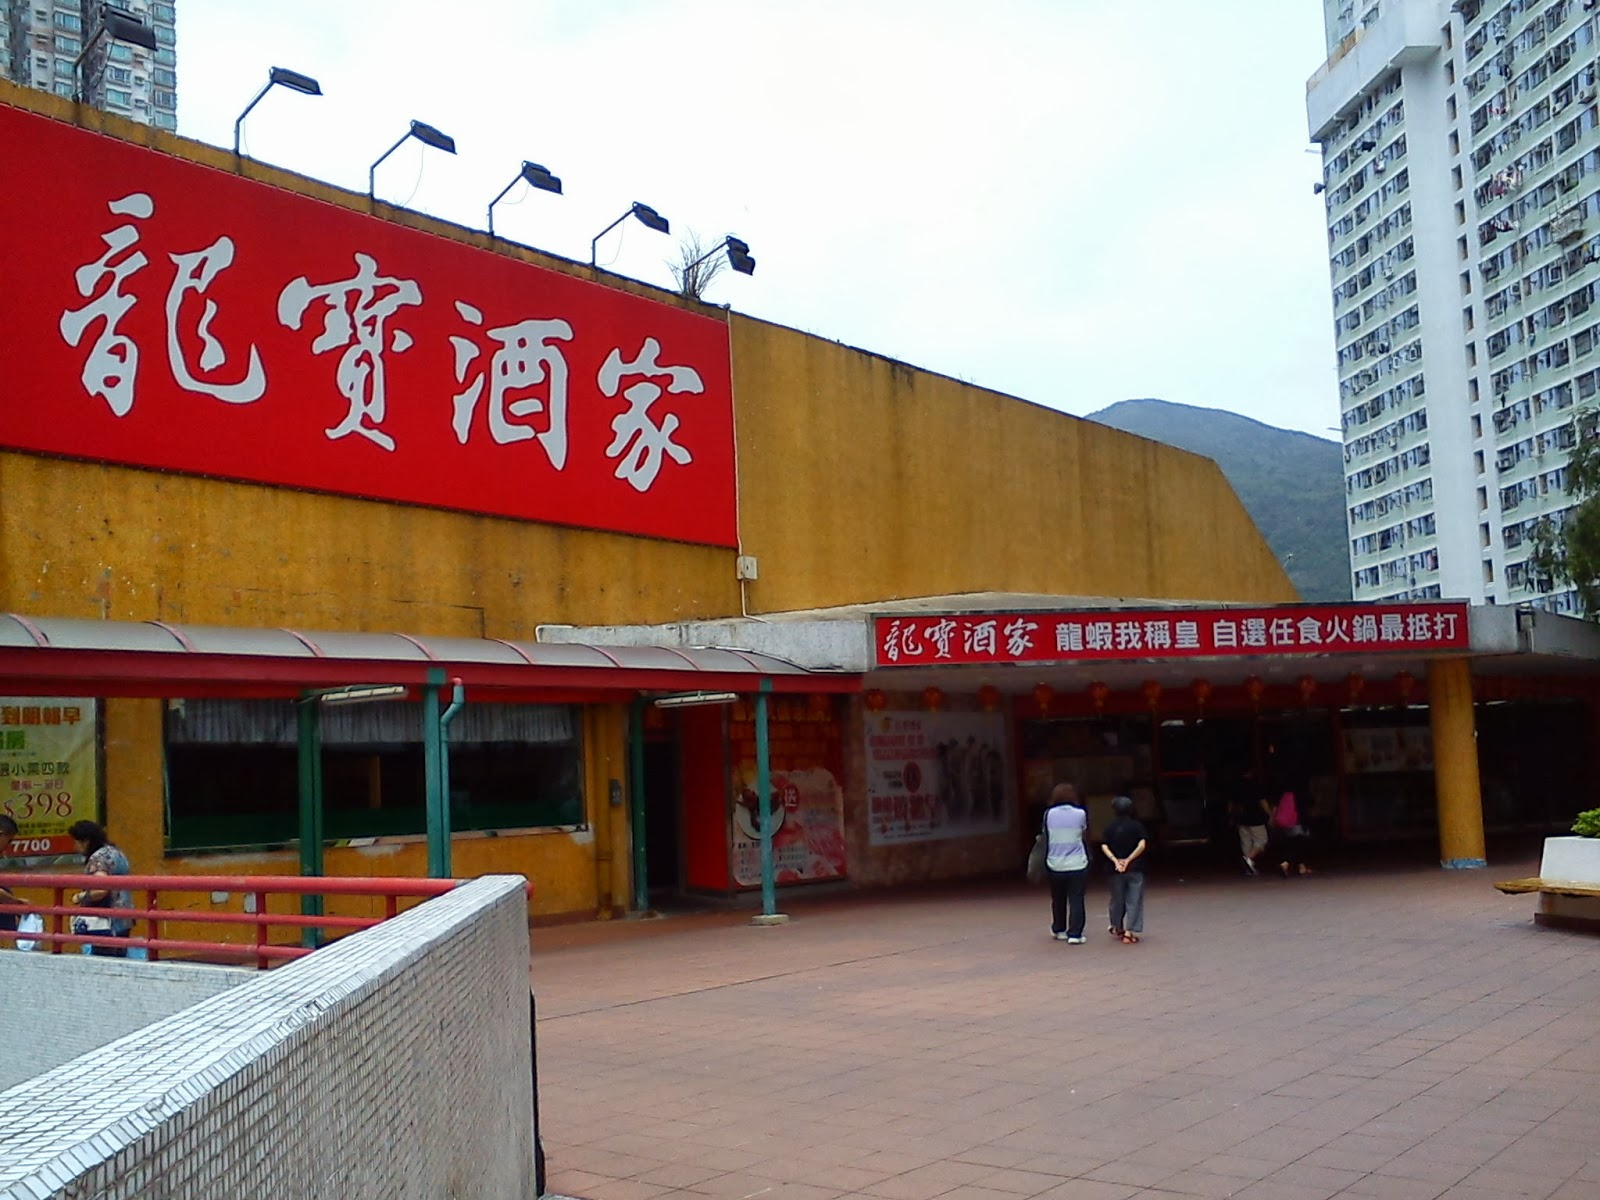 Grassroots O2: 巡視業務.領匯.寶林商場 @2012-06-02